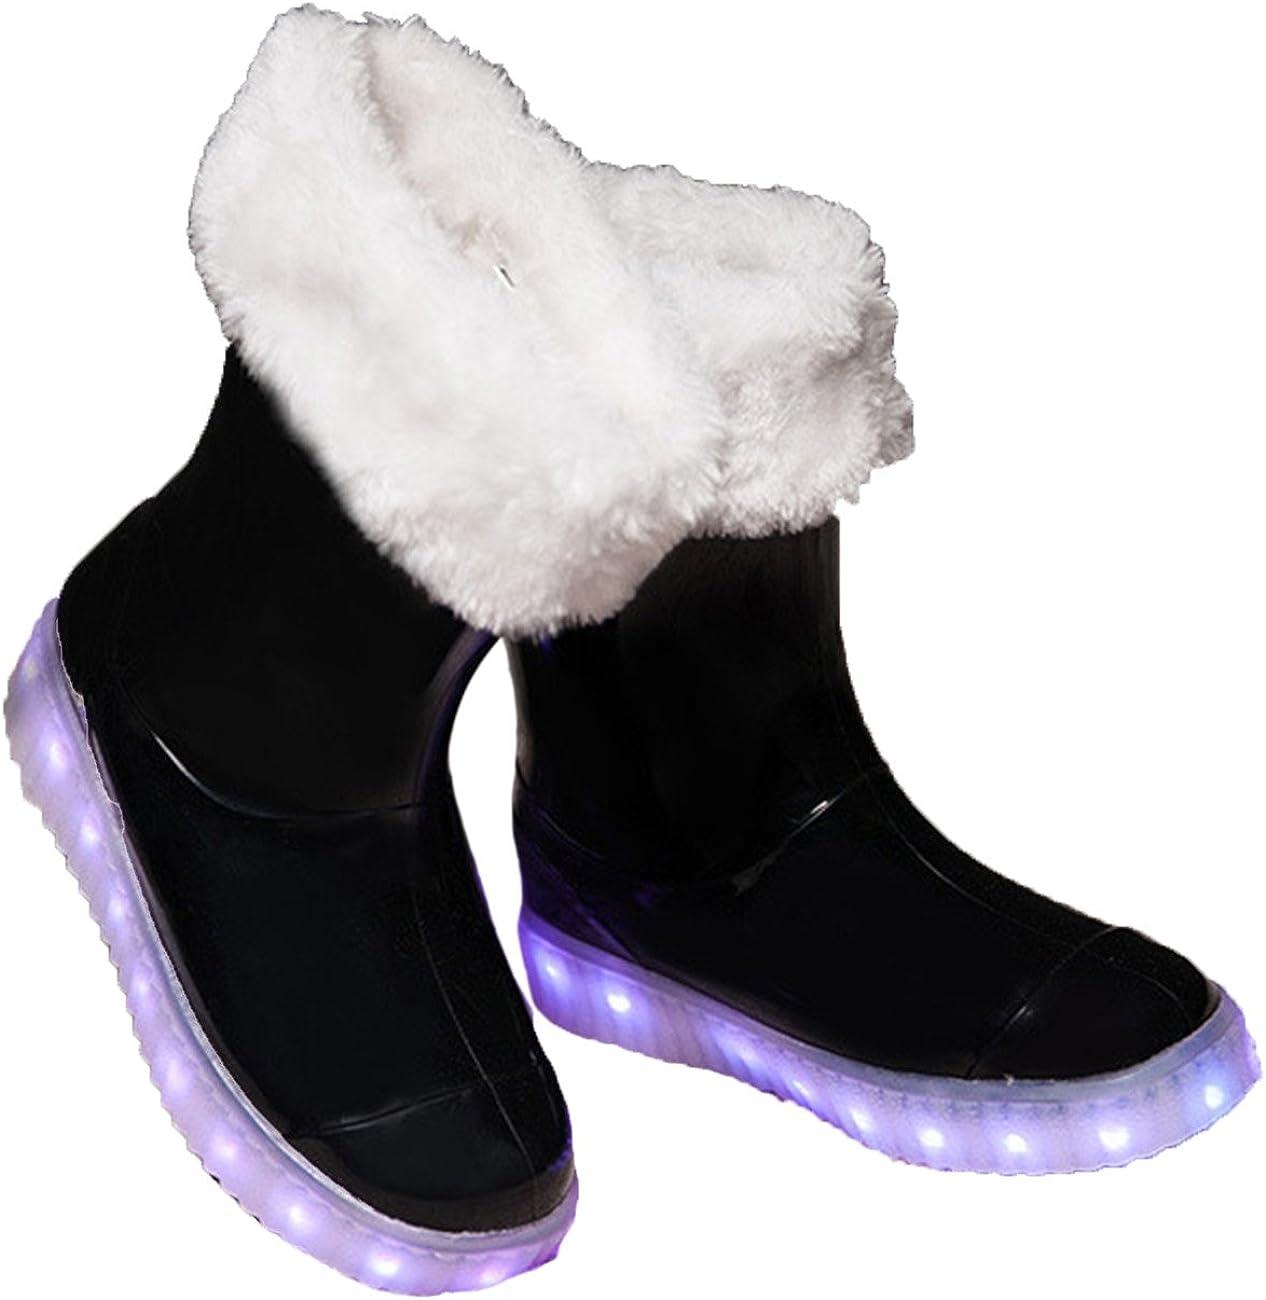 Lemonkid Kids Boys Girls Winter Snow Rain Boots Light up Waterproof LED Shoes